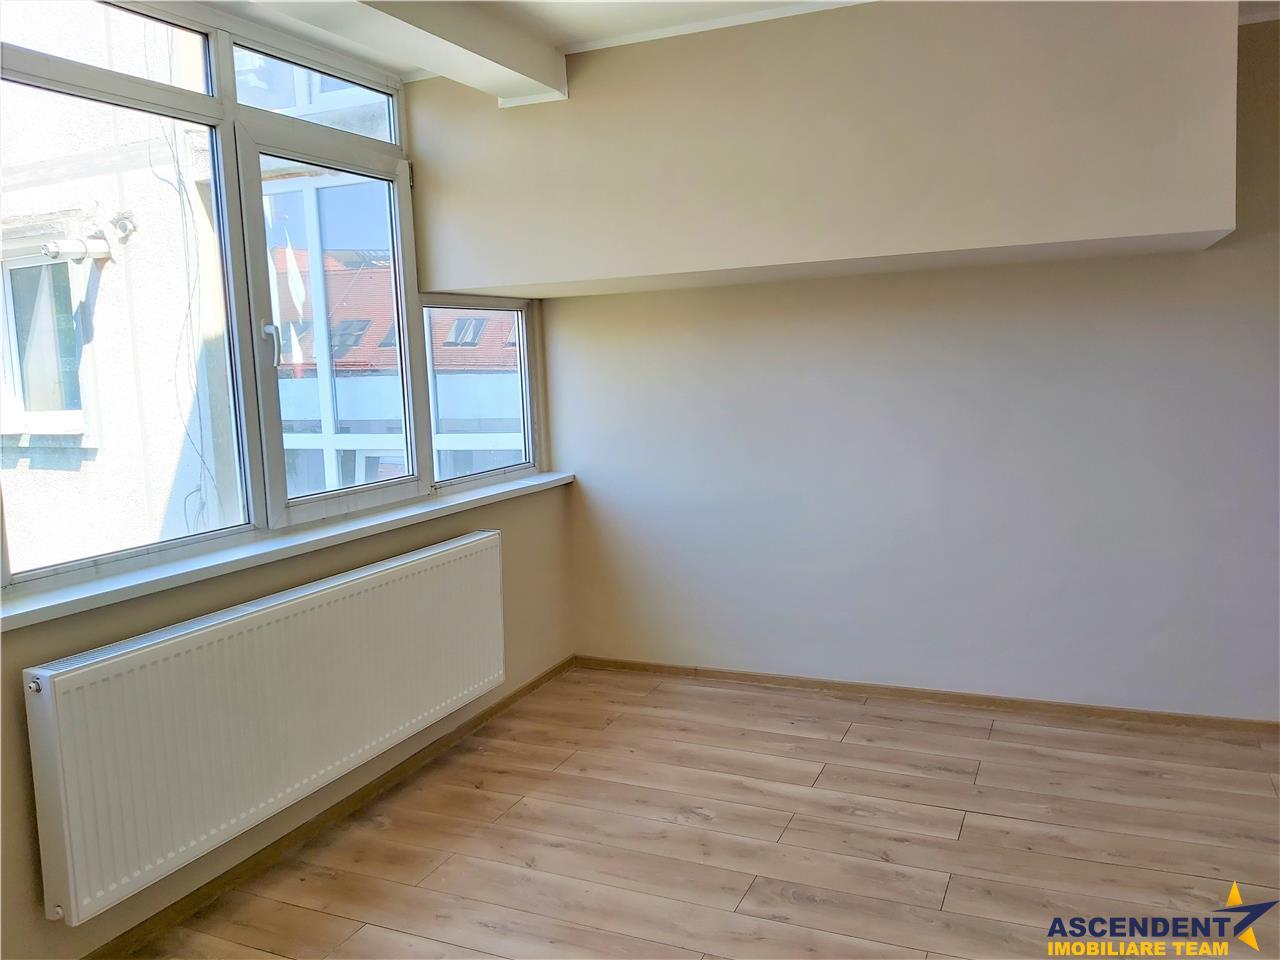 Spatiu birouri, langa Tribunal, Centrul Civic, Brasov